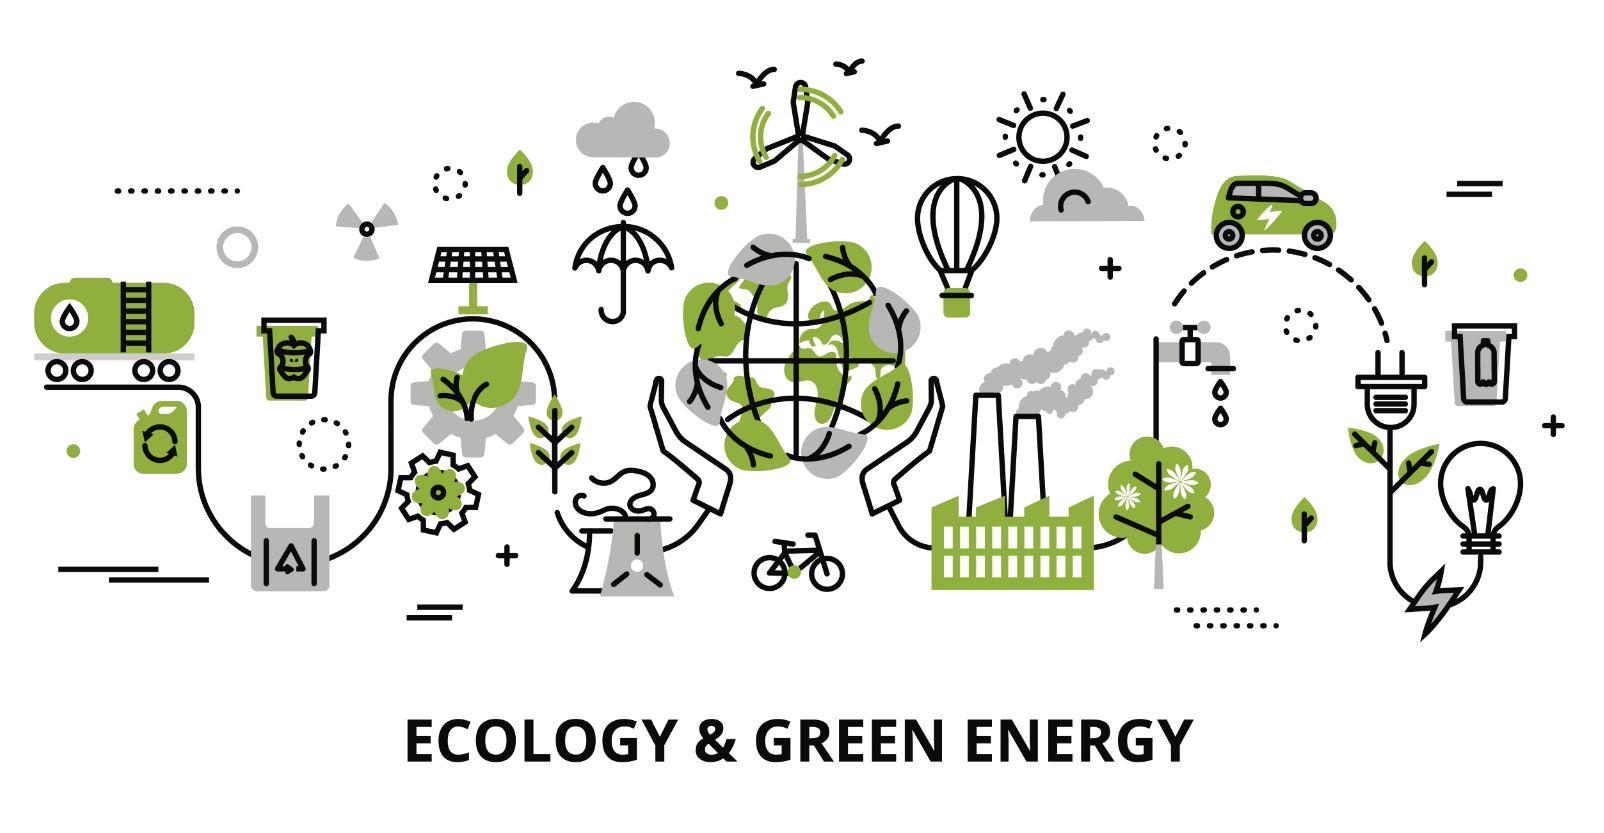 recycling nachhaltigkeit innovation und flash battery